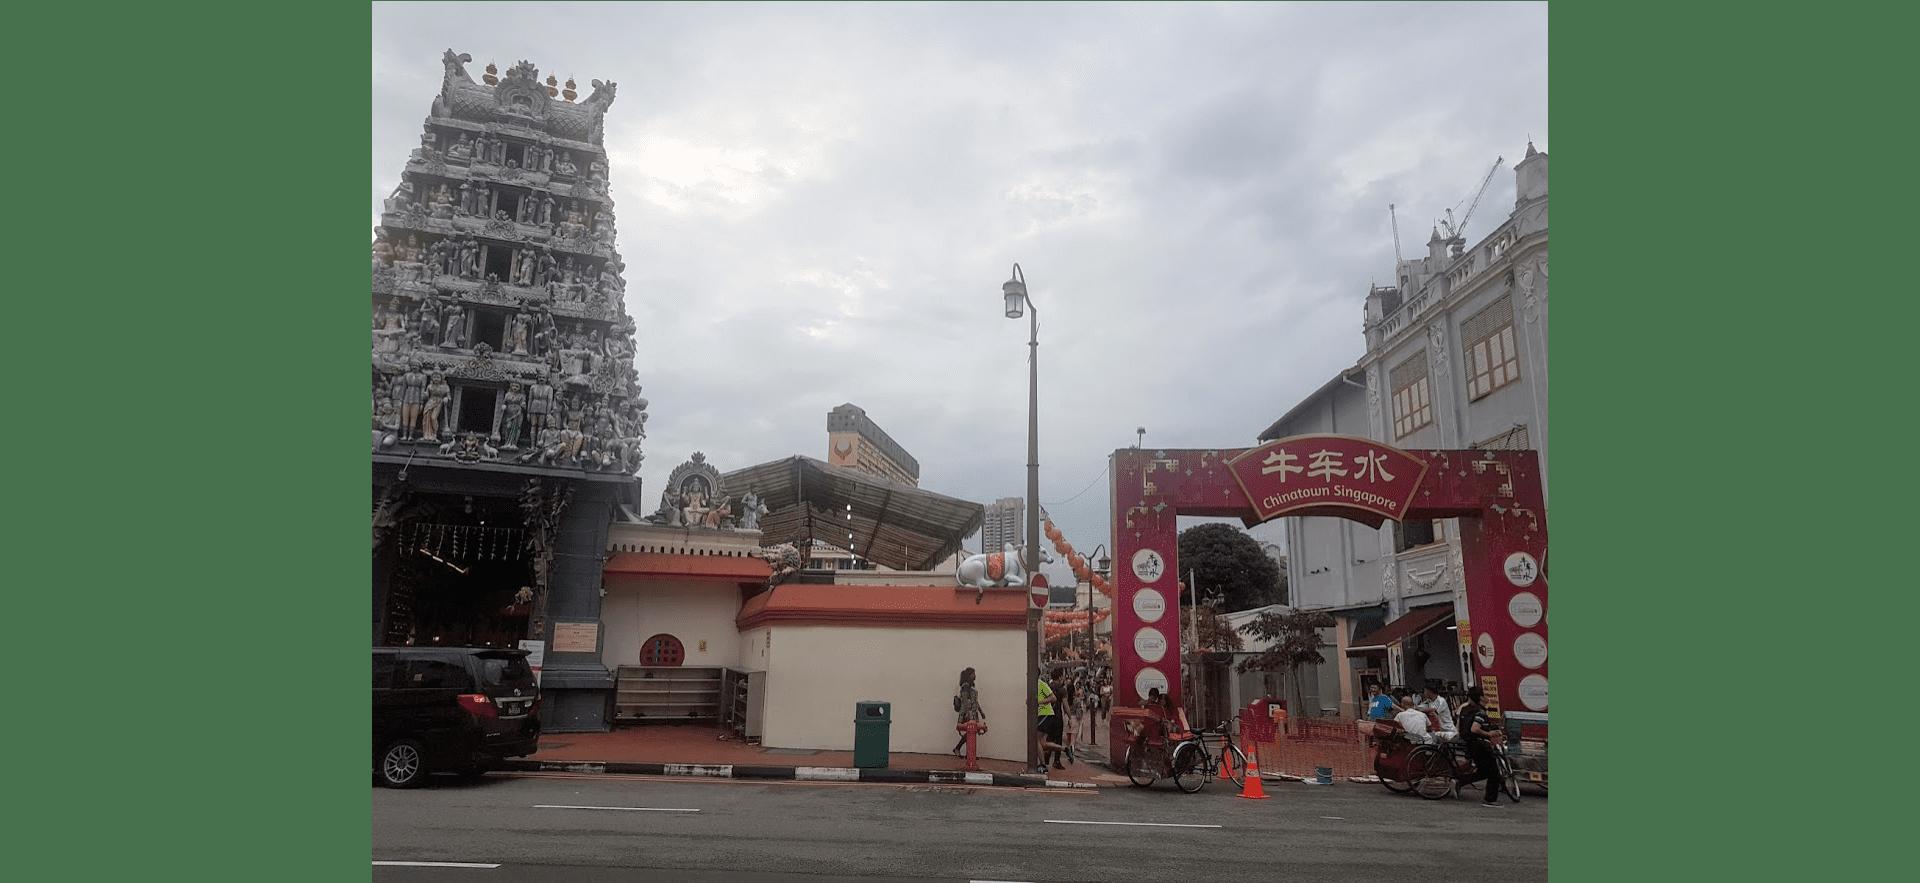 The Sri Mariamman Temple in Chinatown, Singapore